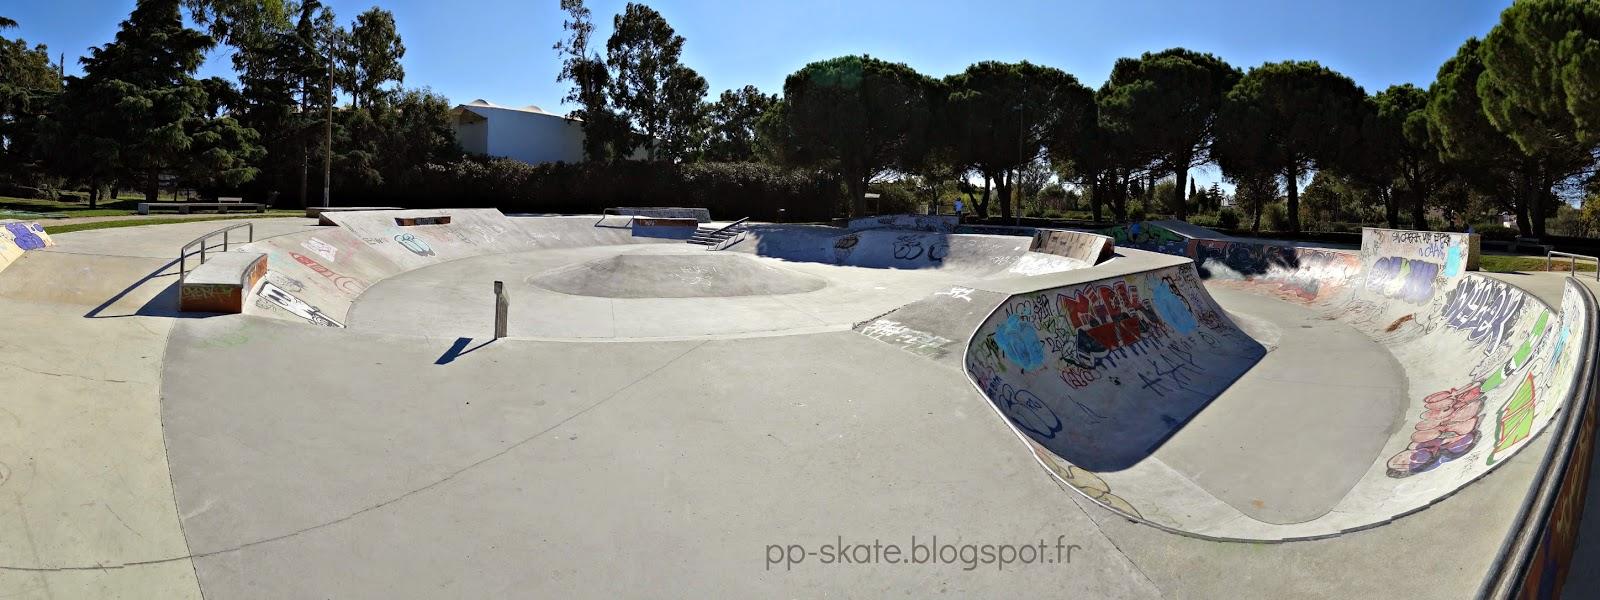 skatepark bowl Fos sur mer